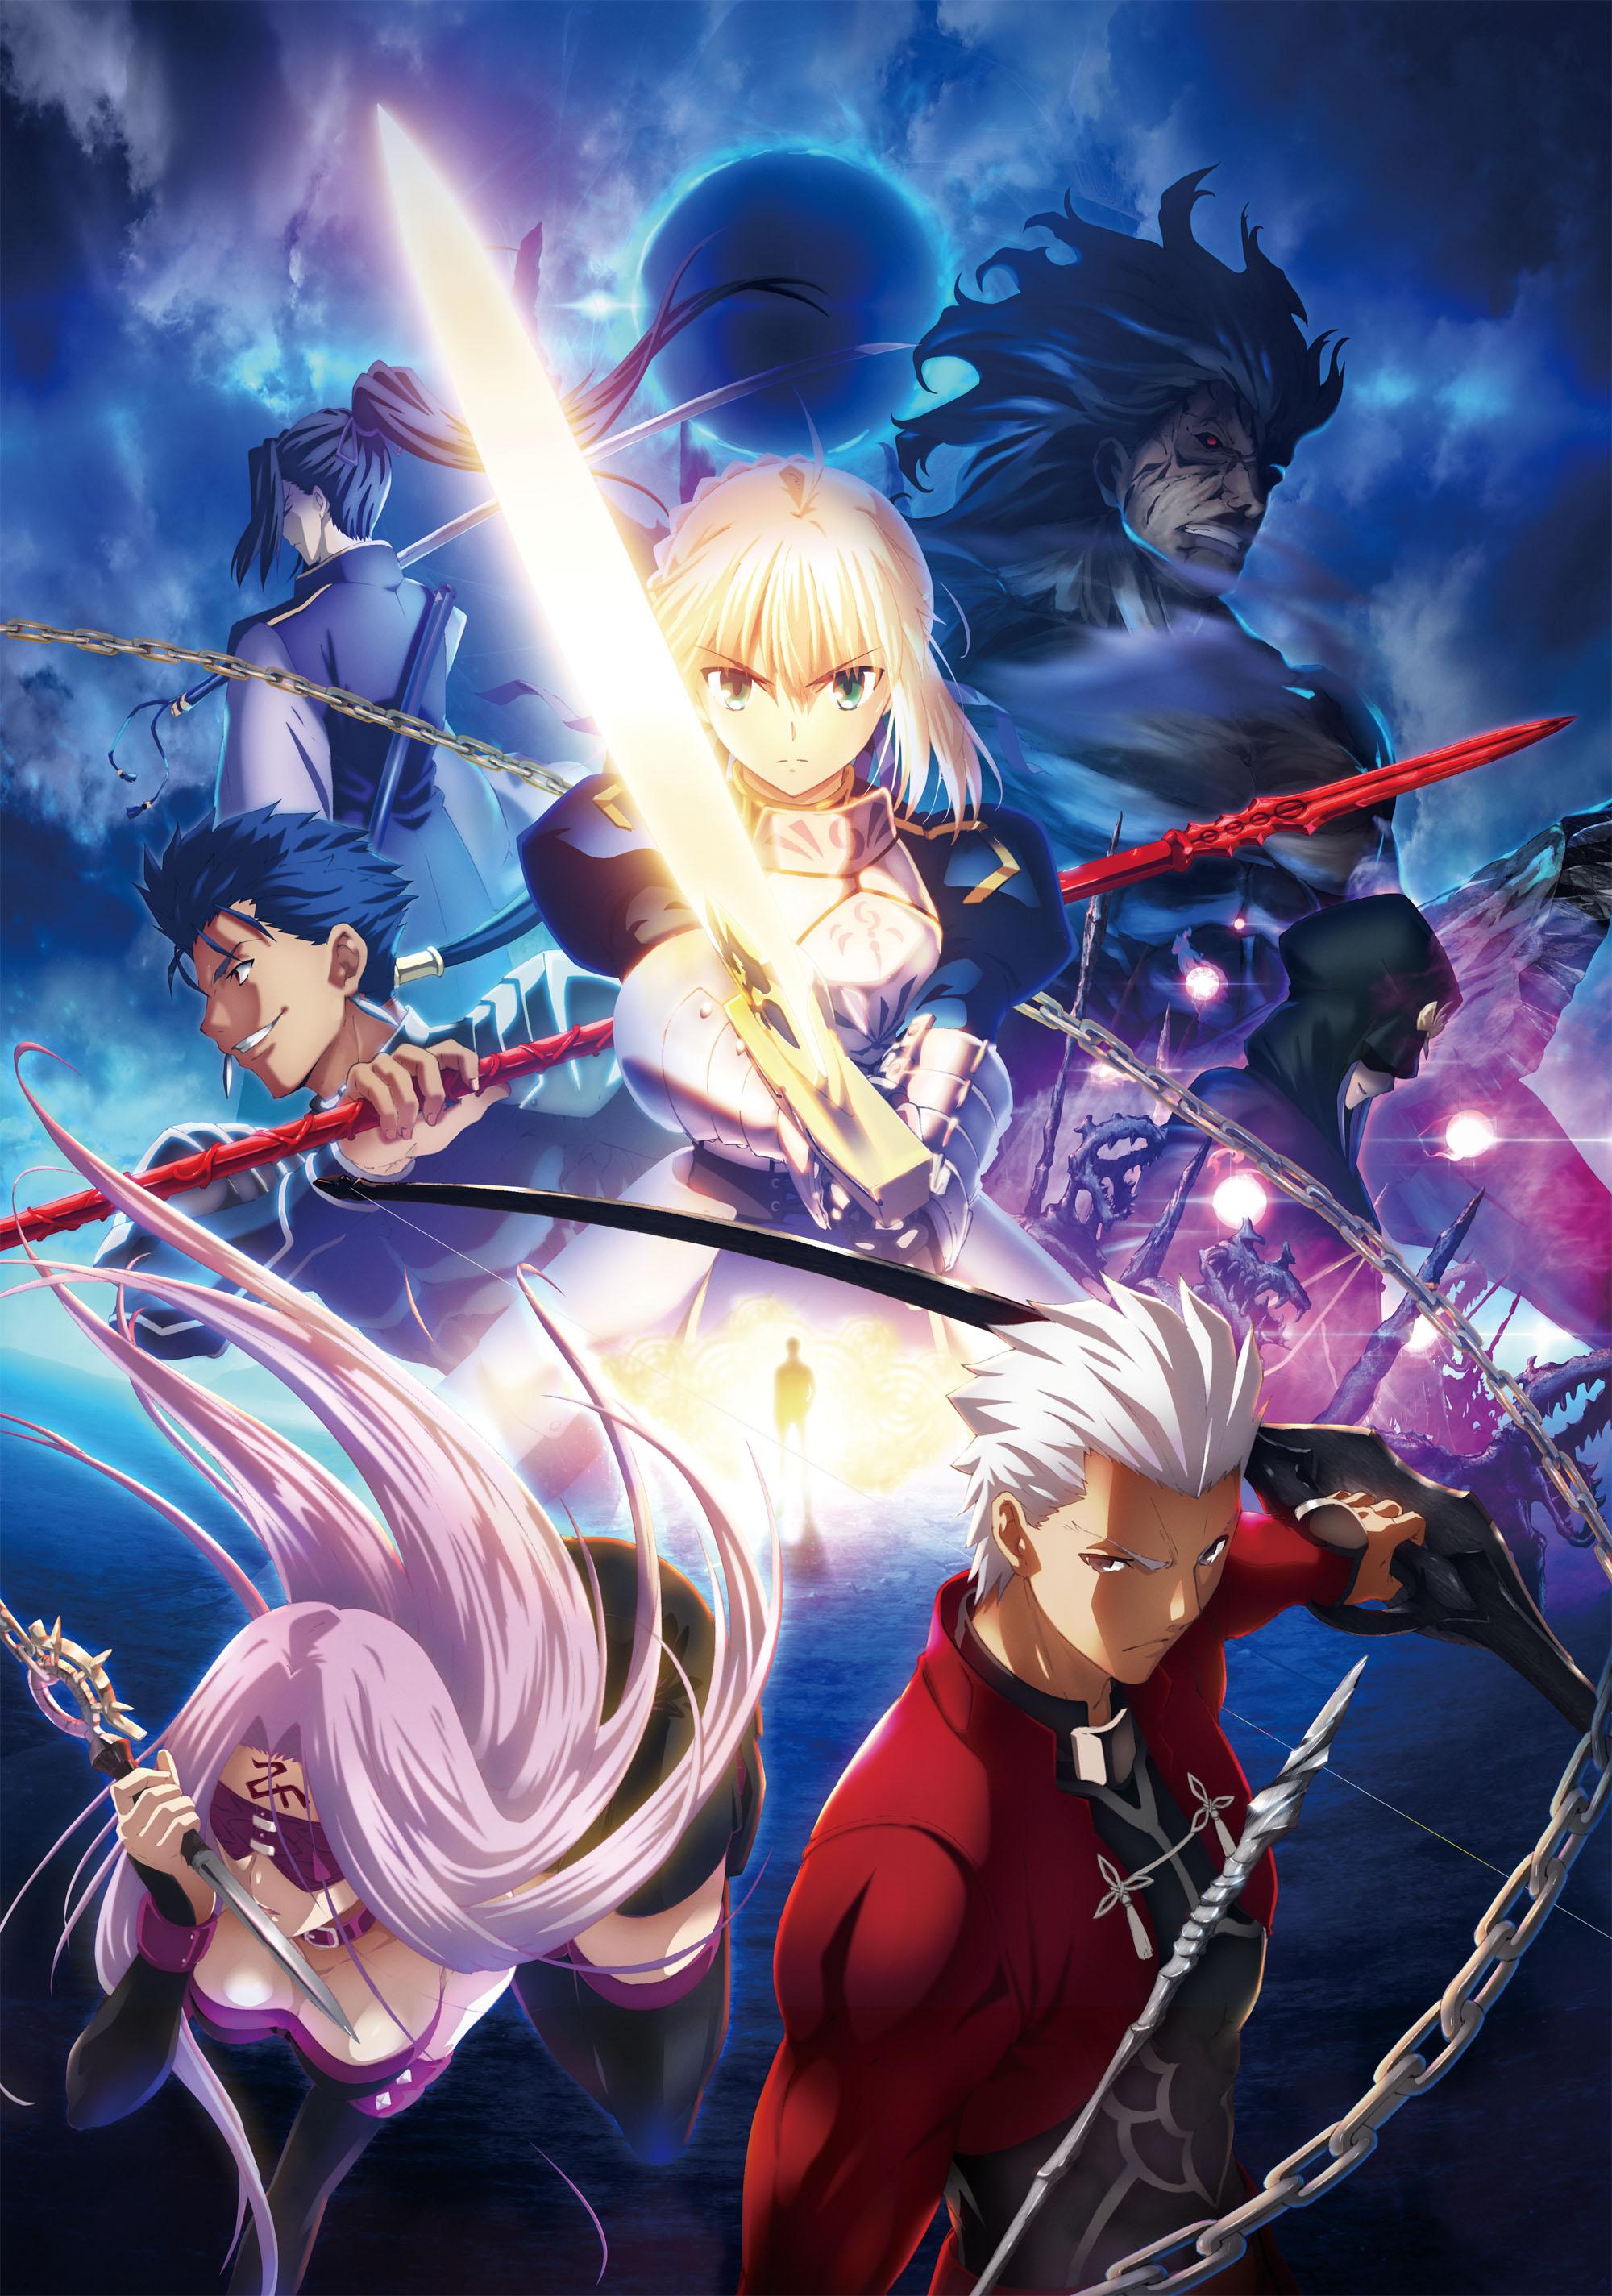 Fate/stay night (アニメ)の画像 p1_2